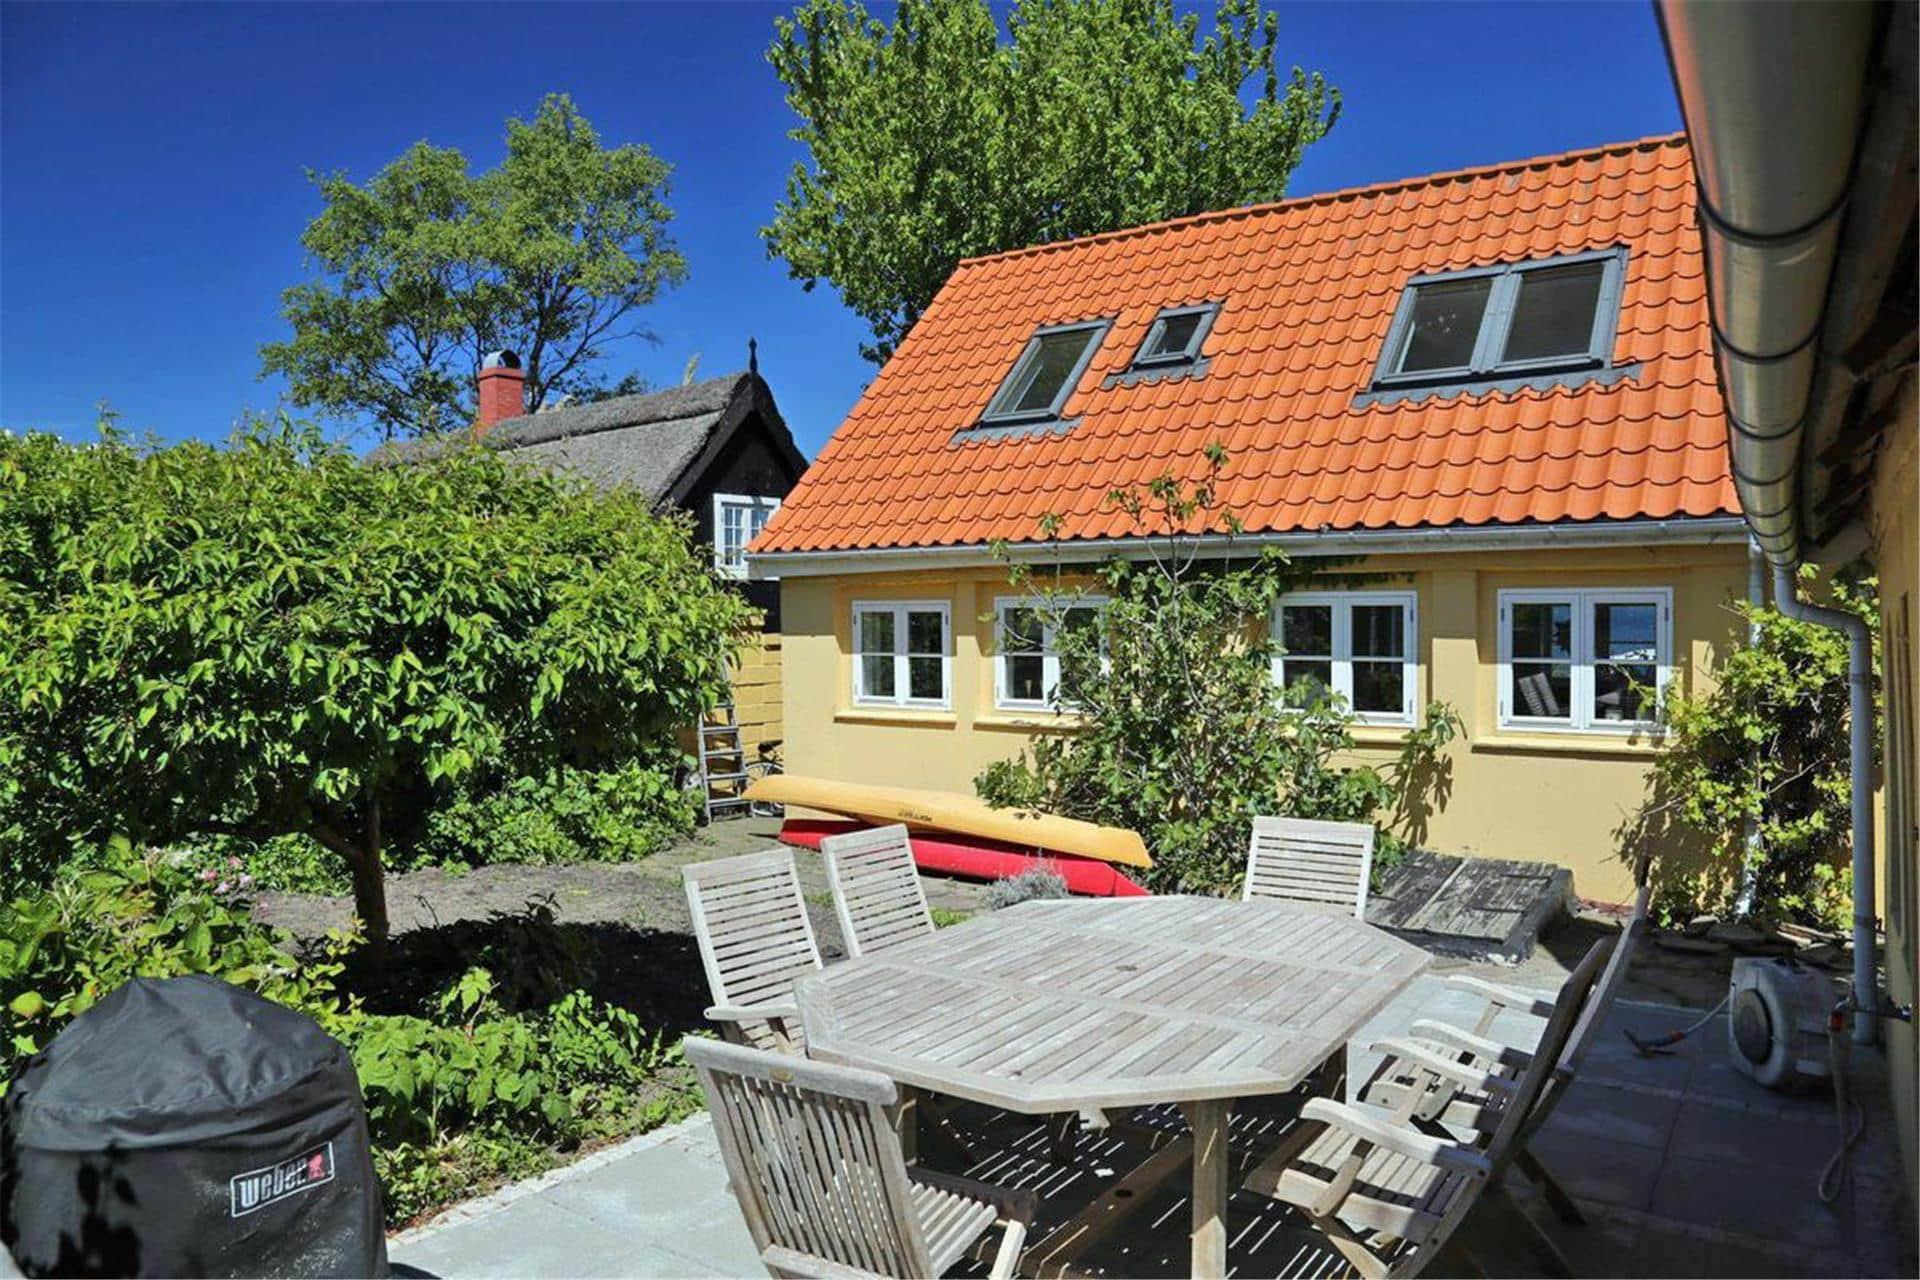 Billede 1-10 Sommerhus 5526, Bølshavn 46, DK - 3740 Svaneke